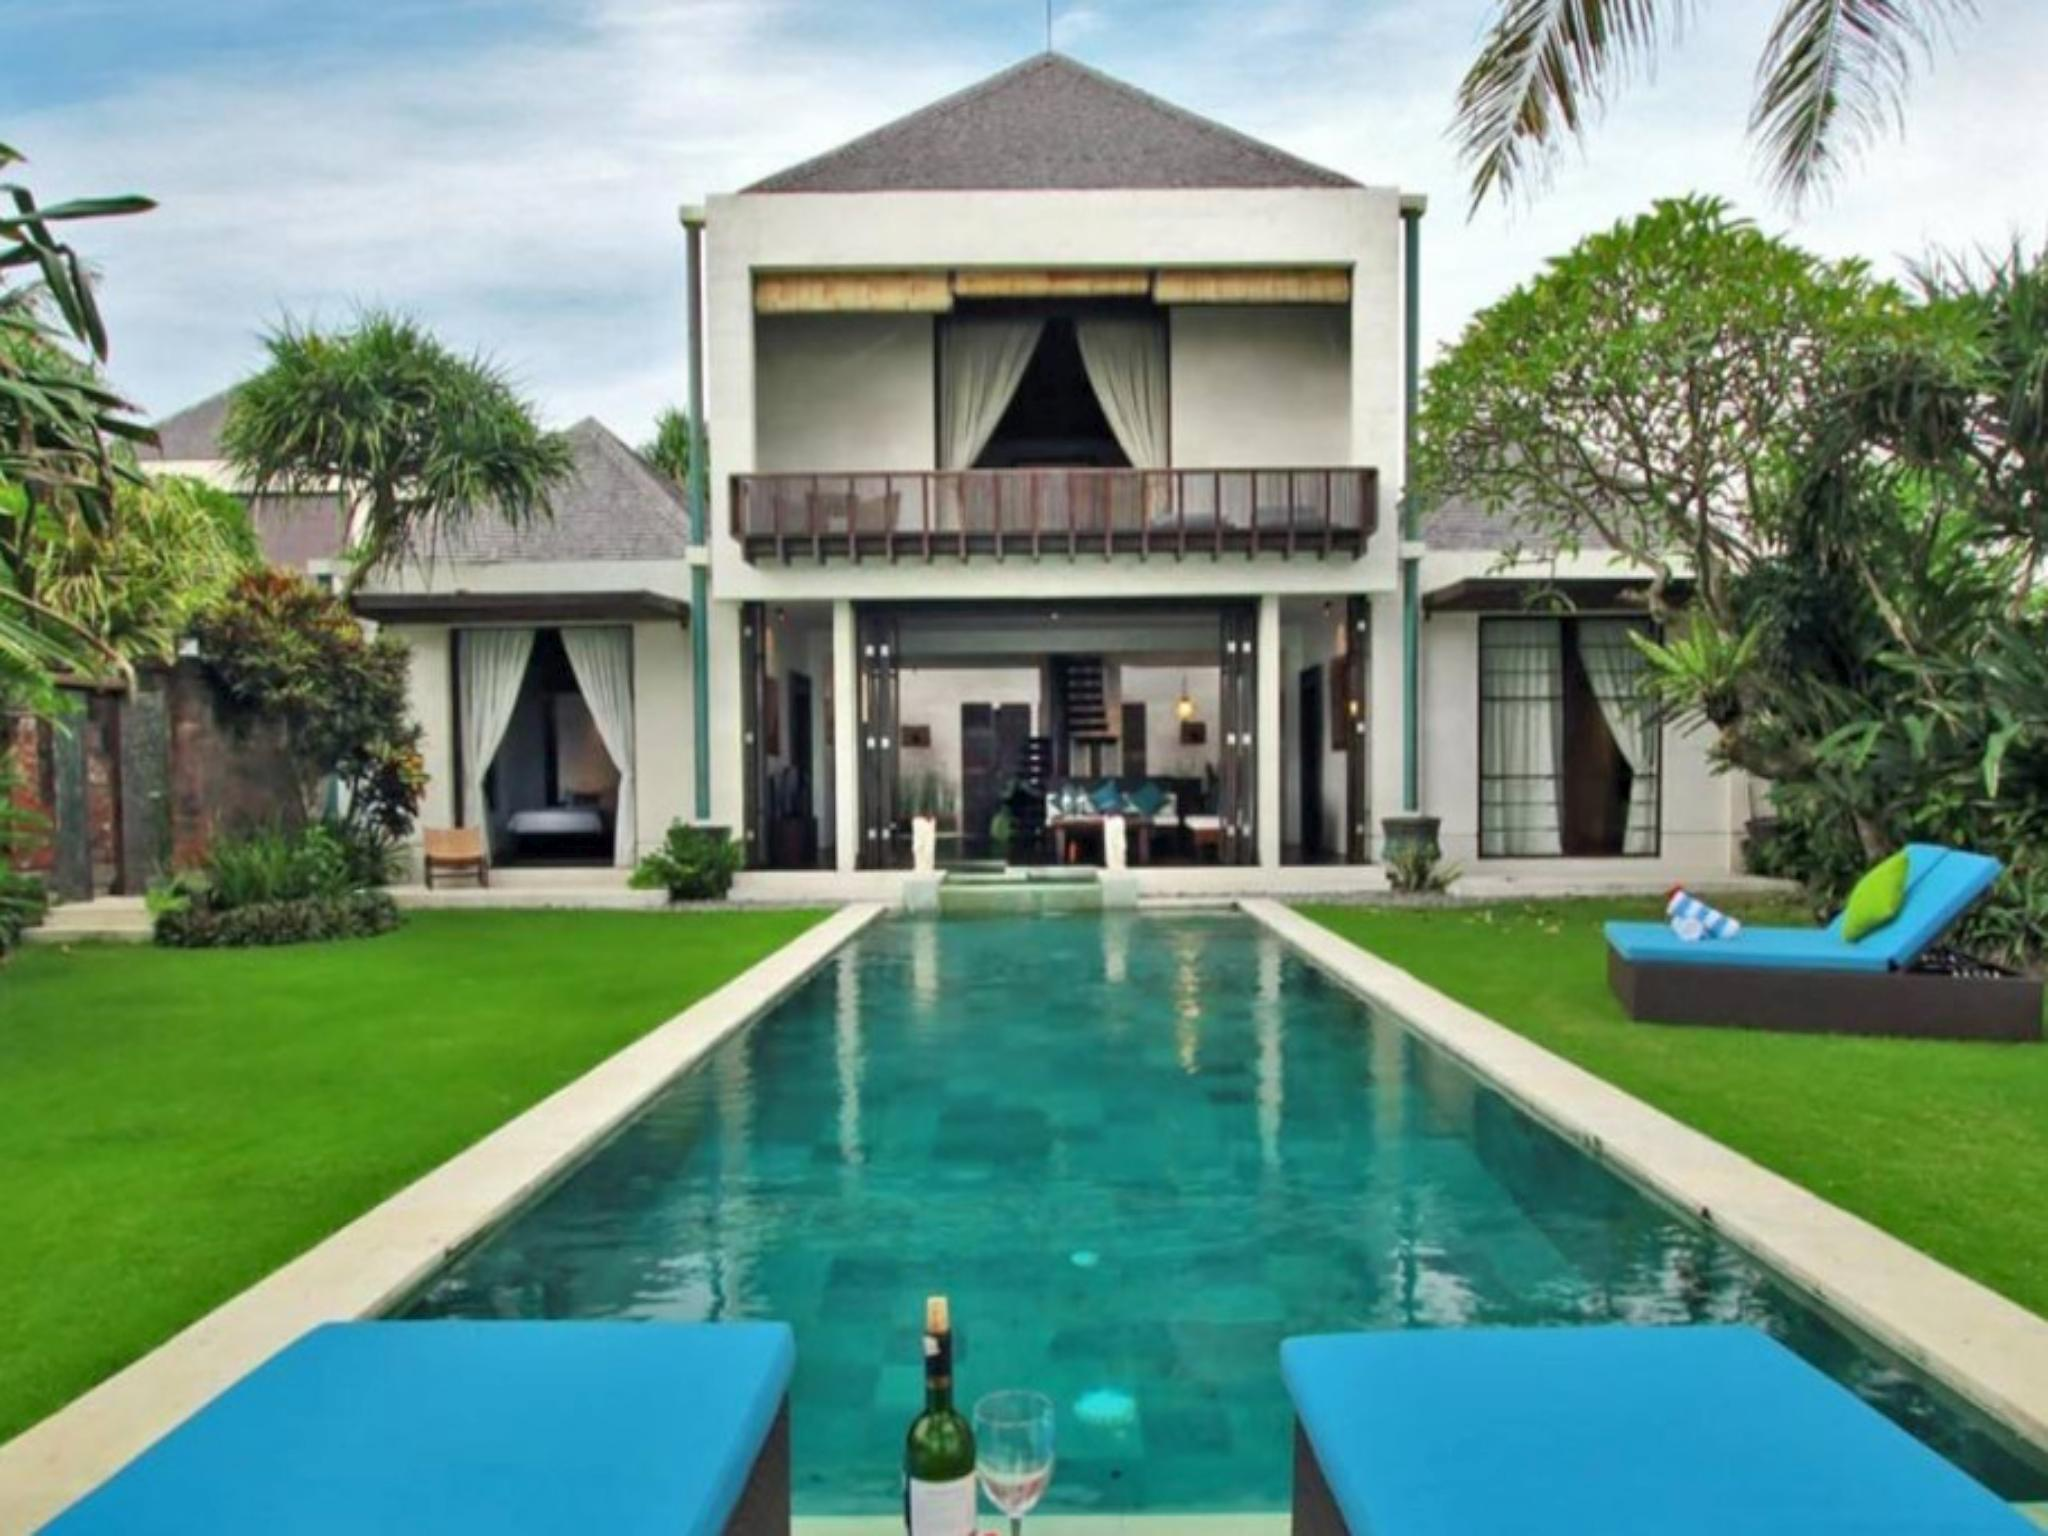 Pesan 3 Bed Beachfront Villa With Garden In Near Sanur Bali